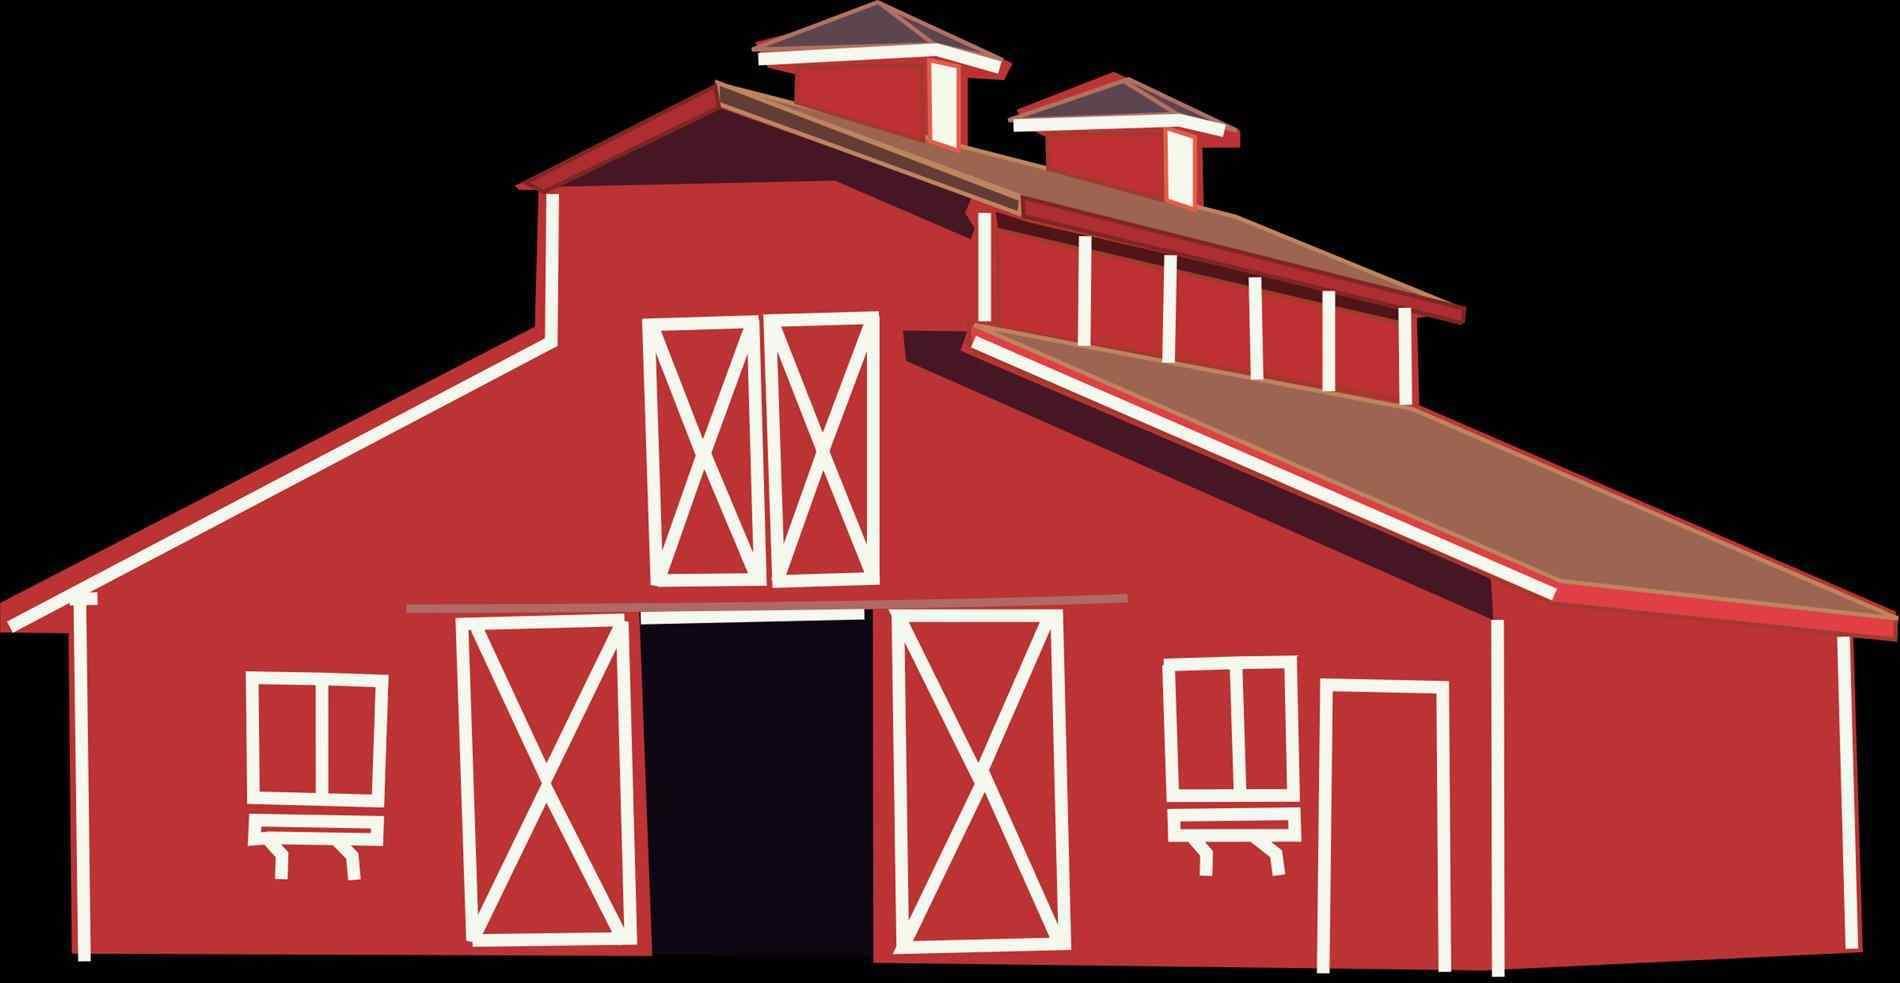 Lightbox red farm doors. Barn clipart rustic barn